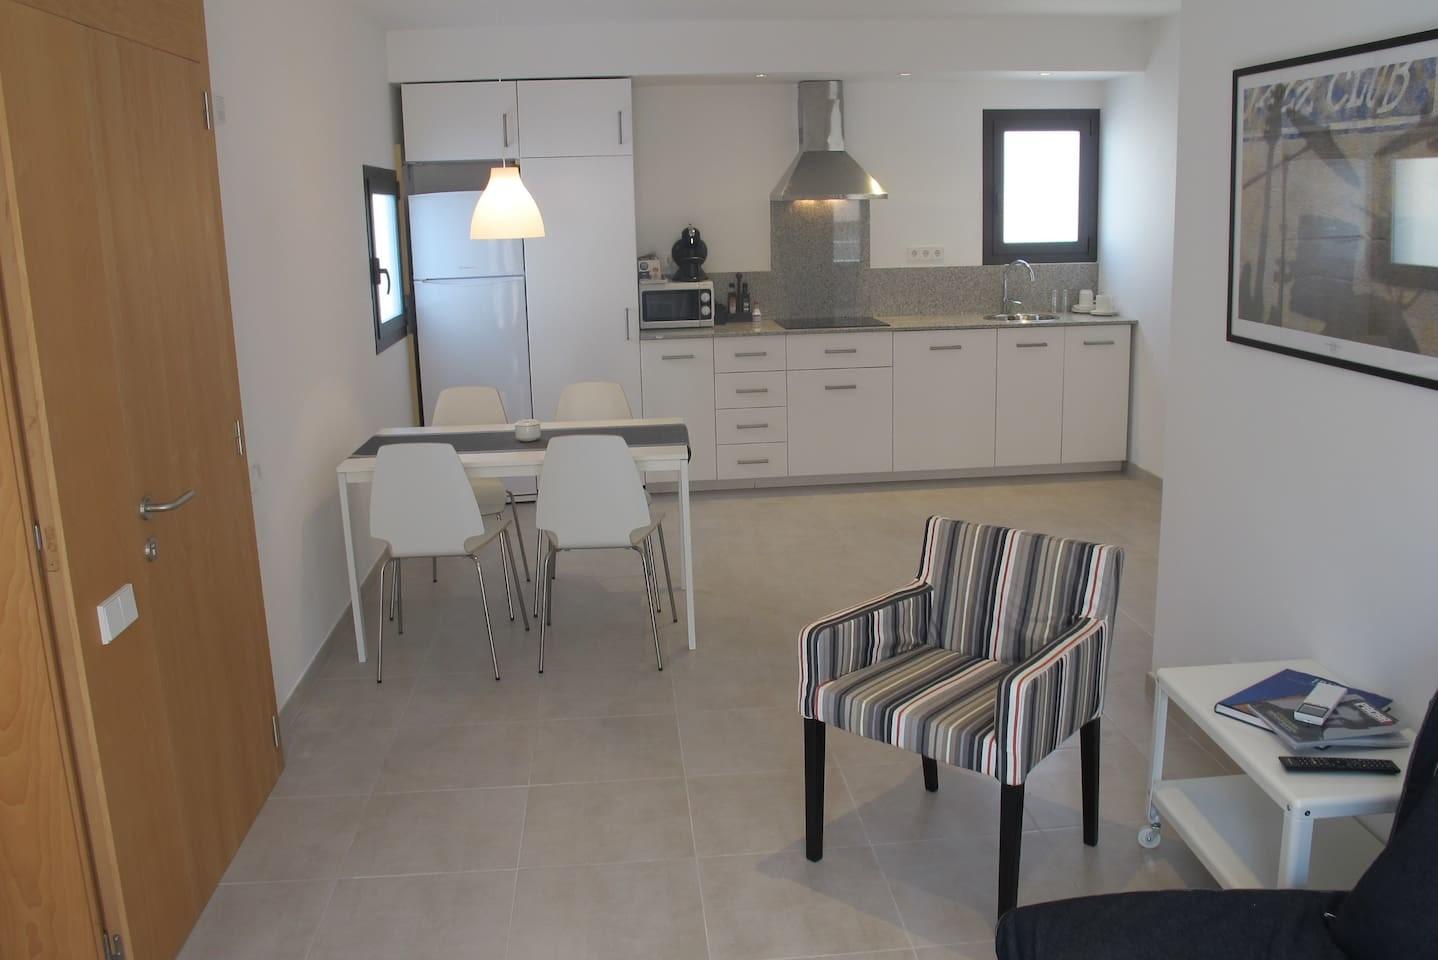 apartamento-centro-ibiza-42dff6366deeff4dfc19b941123062a6